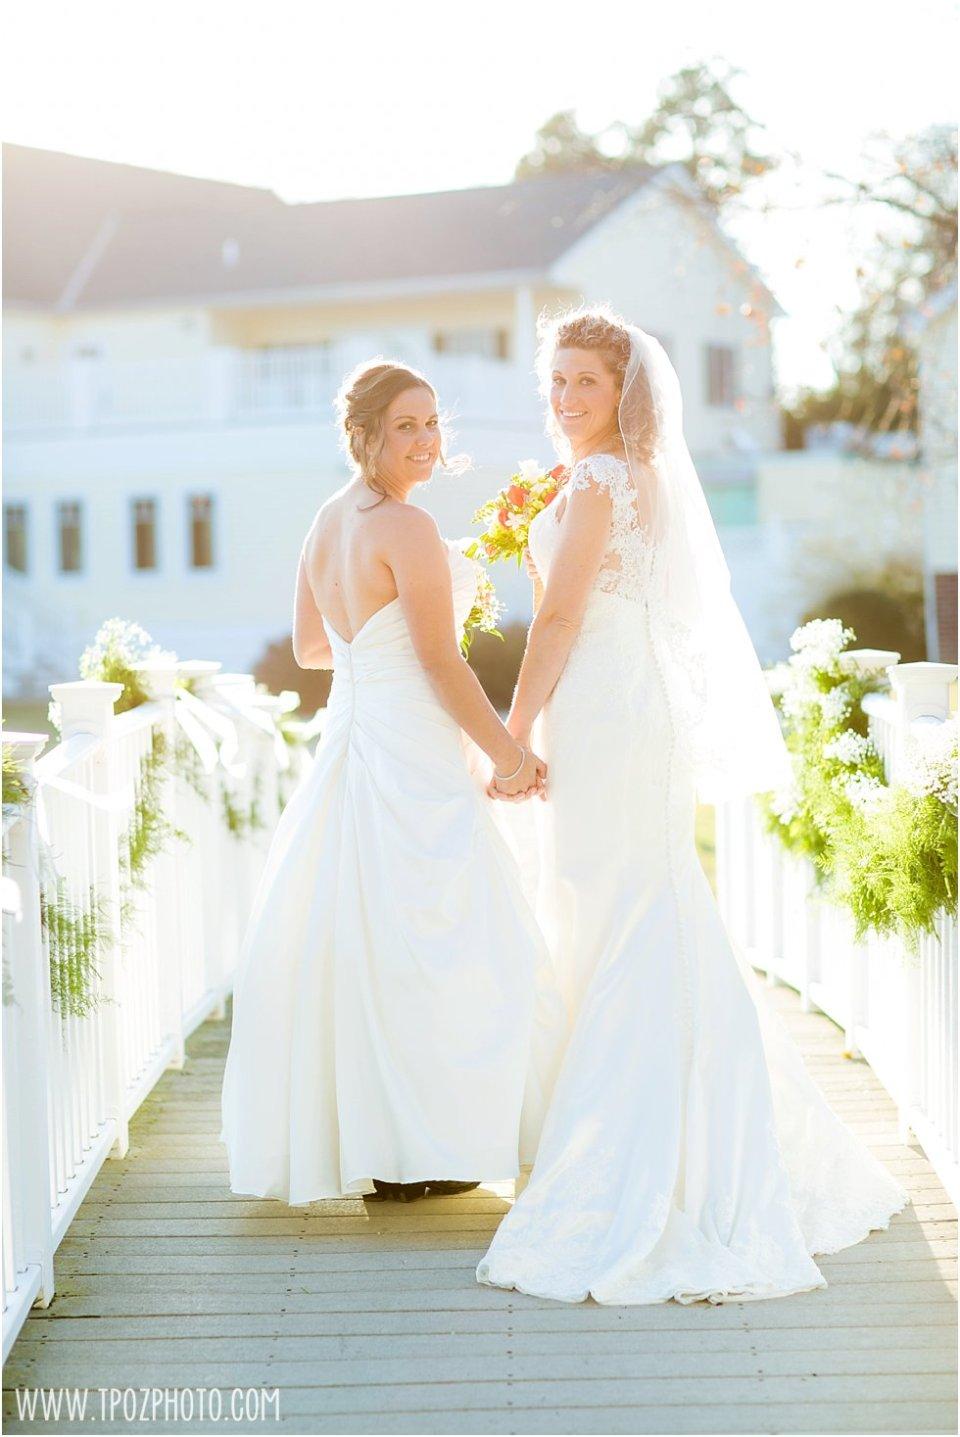 The Oaks lesbian wedding  •  tPoz Photography  •  www.tpozphoto.com